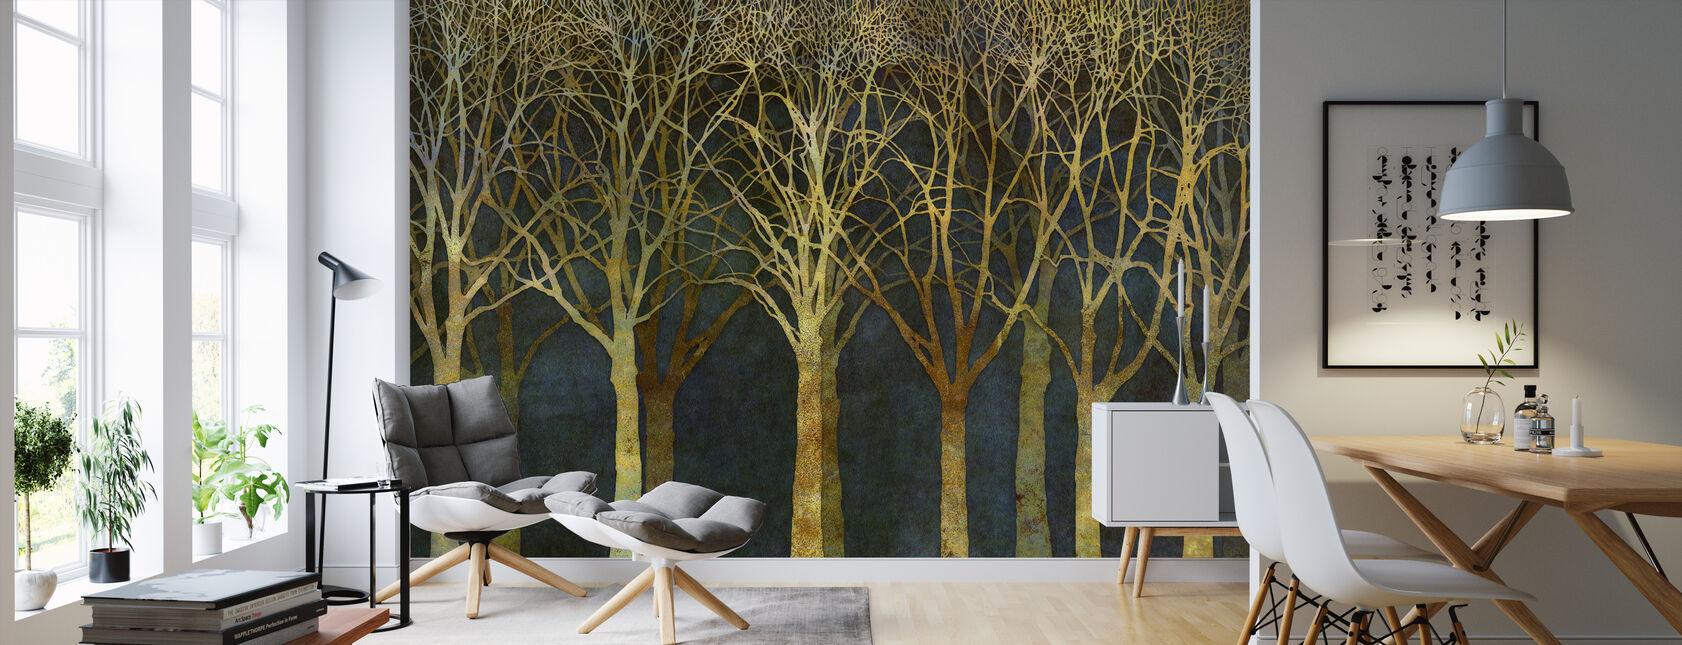 Birch Grove Moonlight - Wallpaper - Living Room